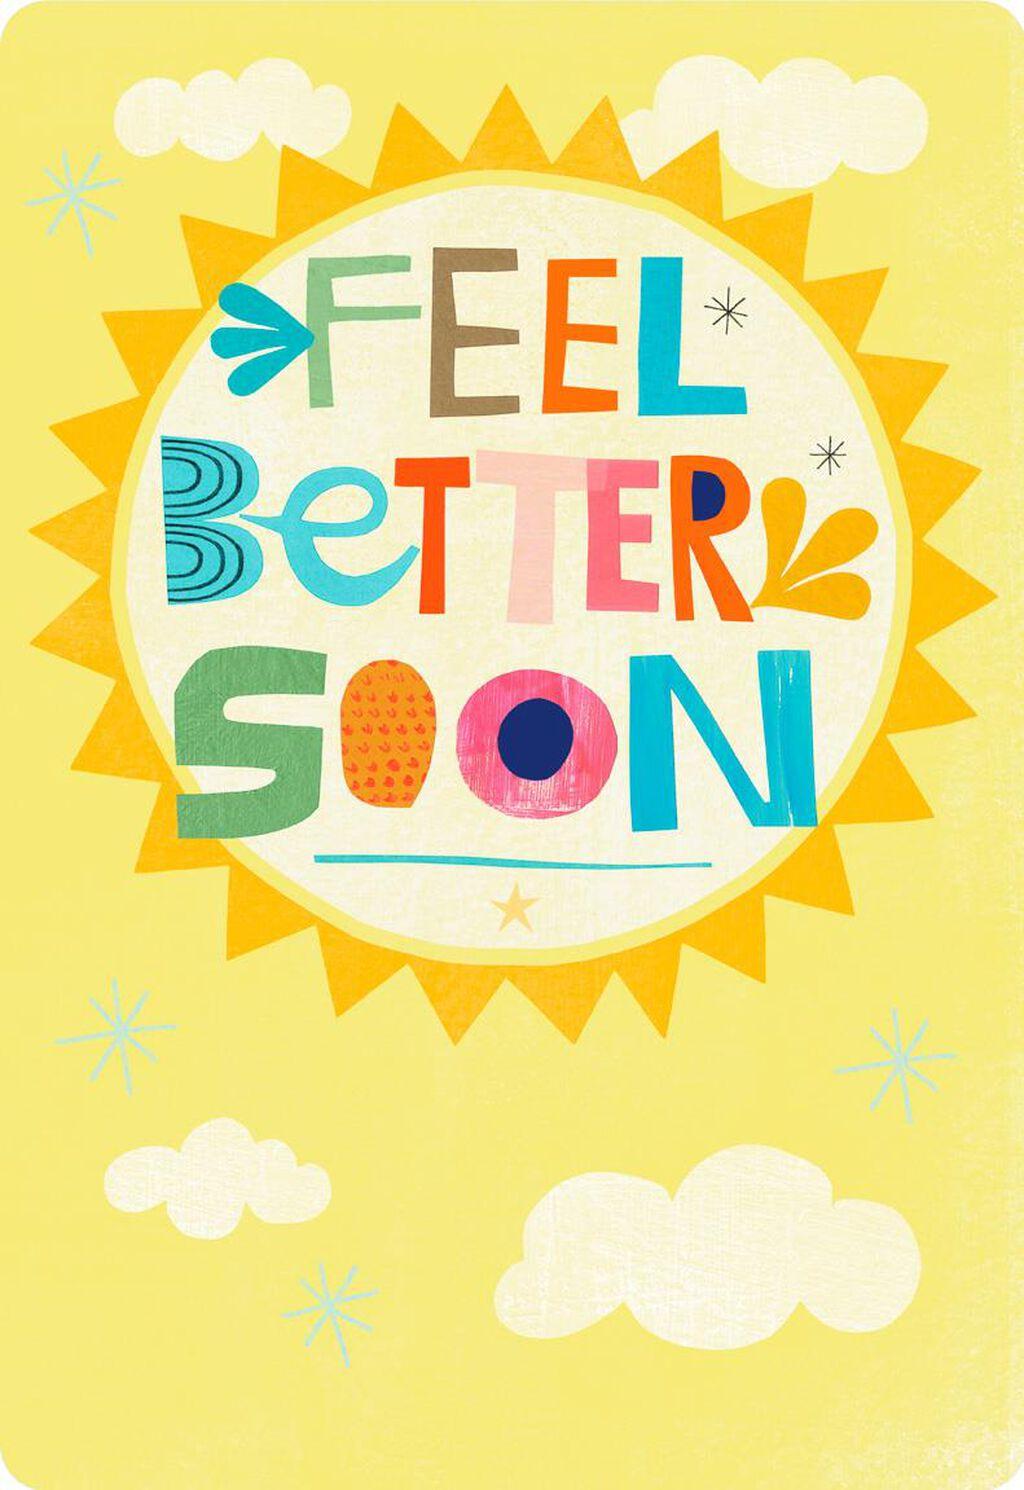 Feel Better Soon Sun Jumbo Get Well Card 1625 Greeting Cards